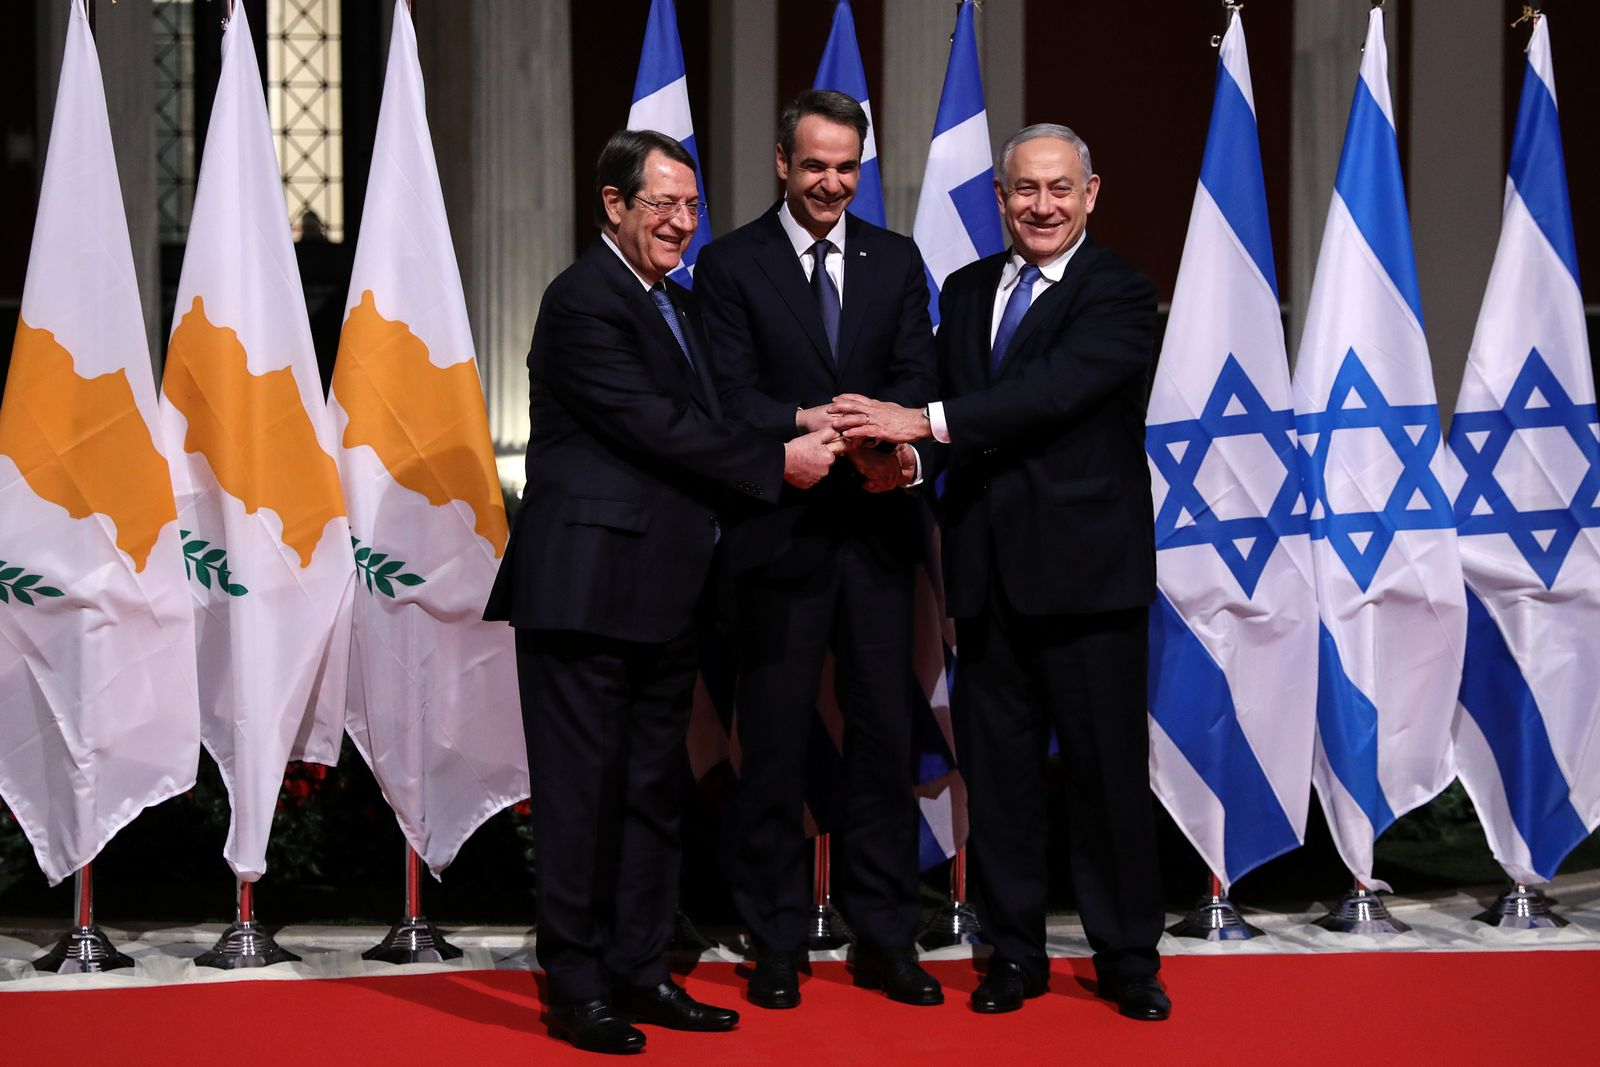 Pipeline-Abkommen Griechenland, Israel